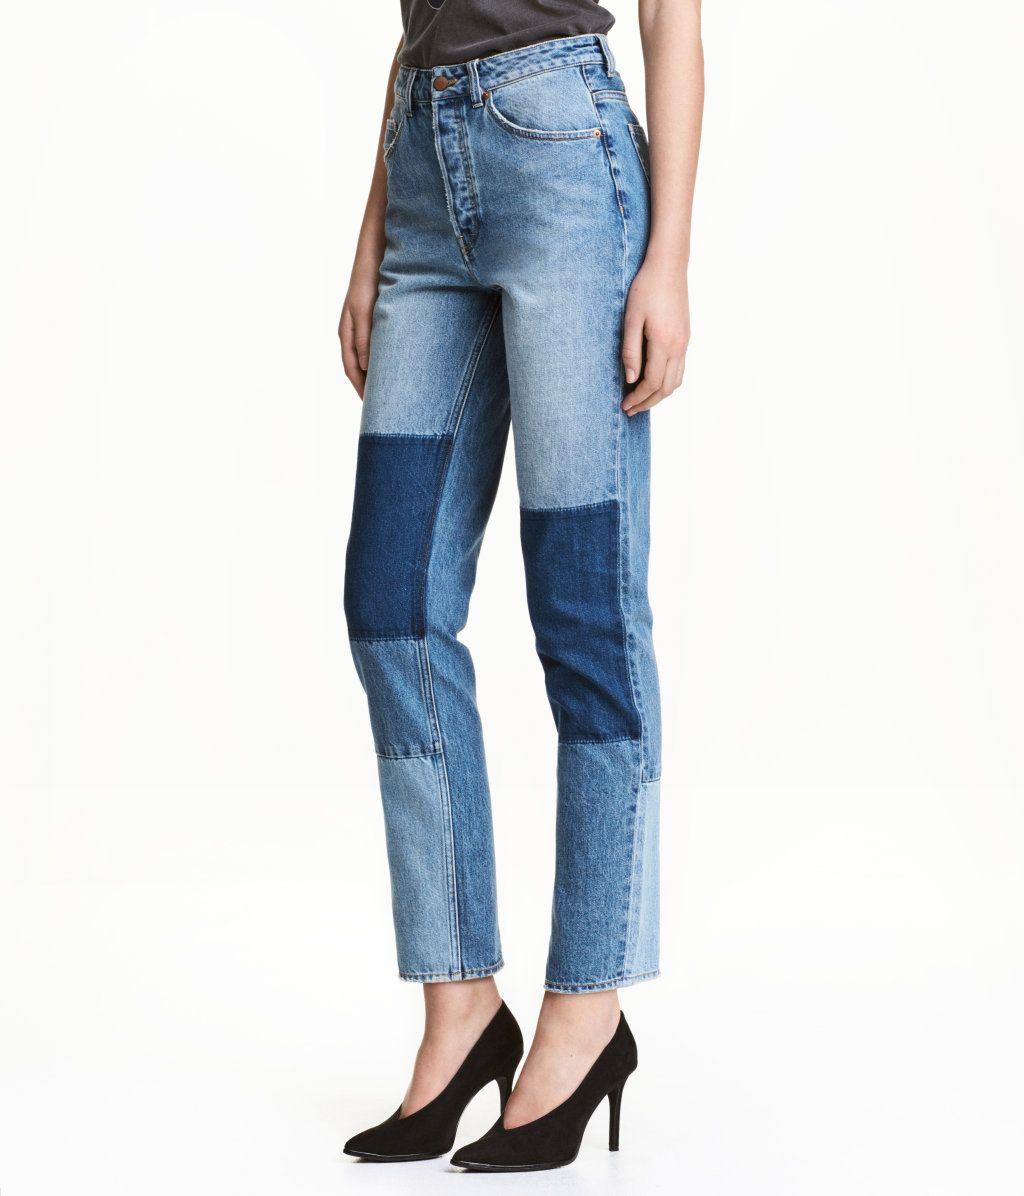 65670bf0 Loose fit Regular Jeans | Denimblå | Dame | H&M NO | Go store ...